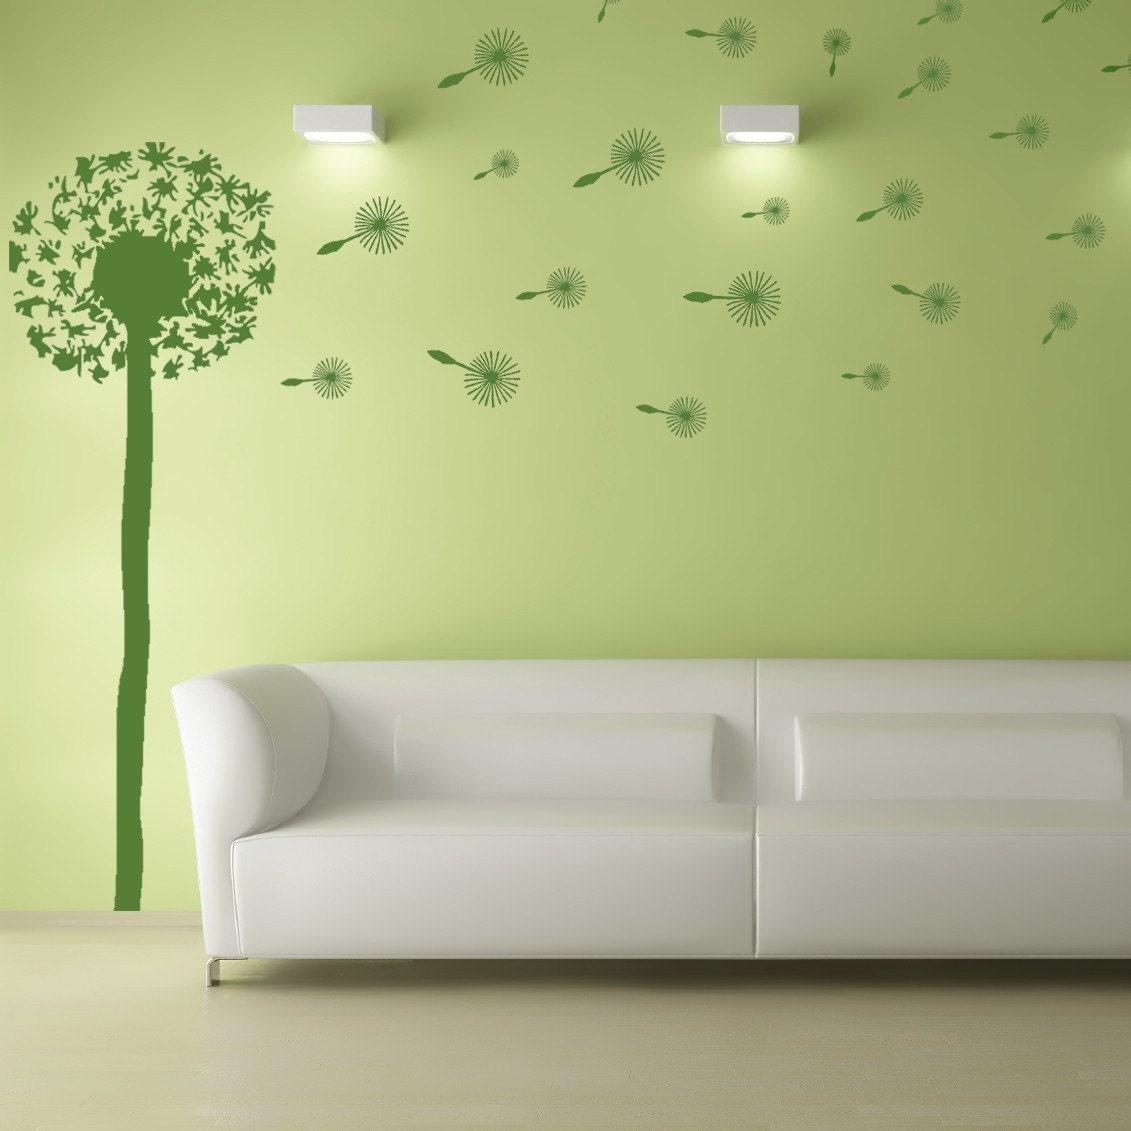 Cool Wallpaper For Home Hd Widescreen Desktop Mobile Iphone Windowns7 Phone Girls Ipod